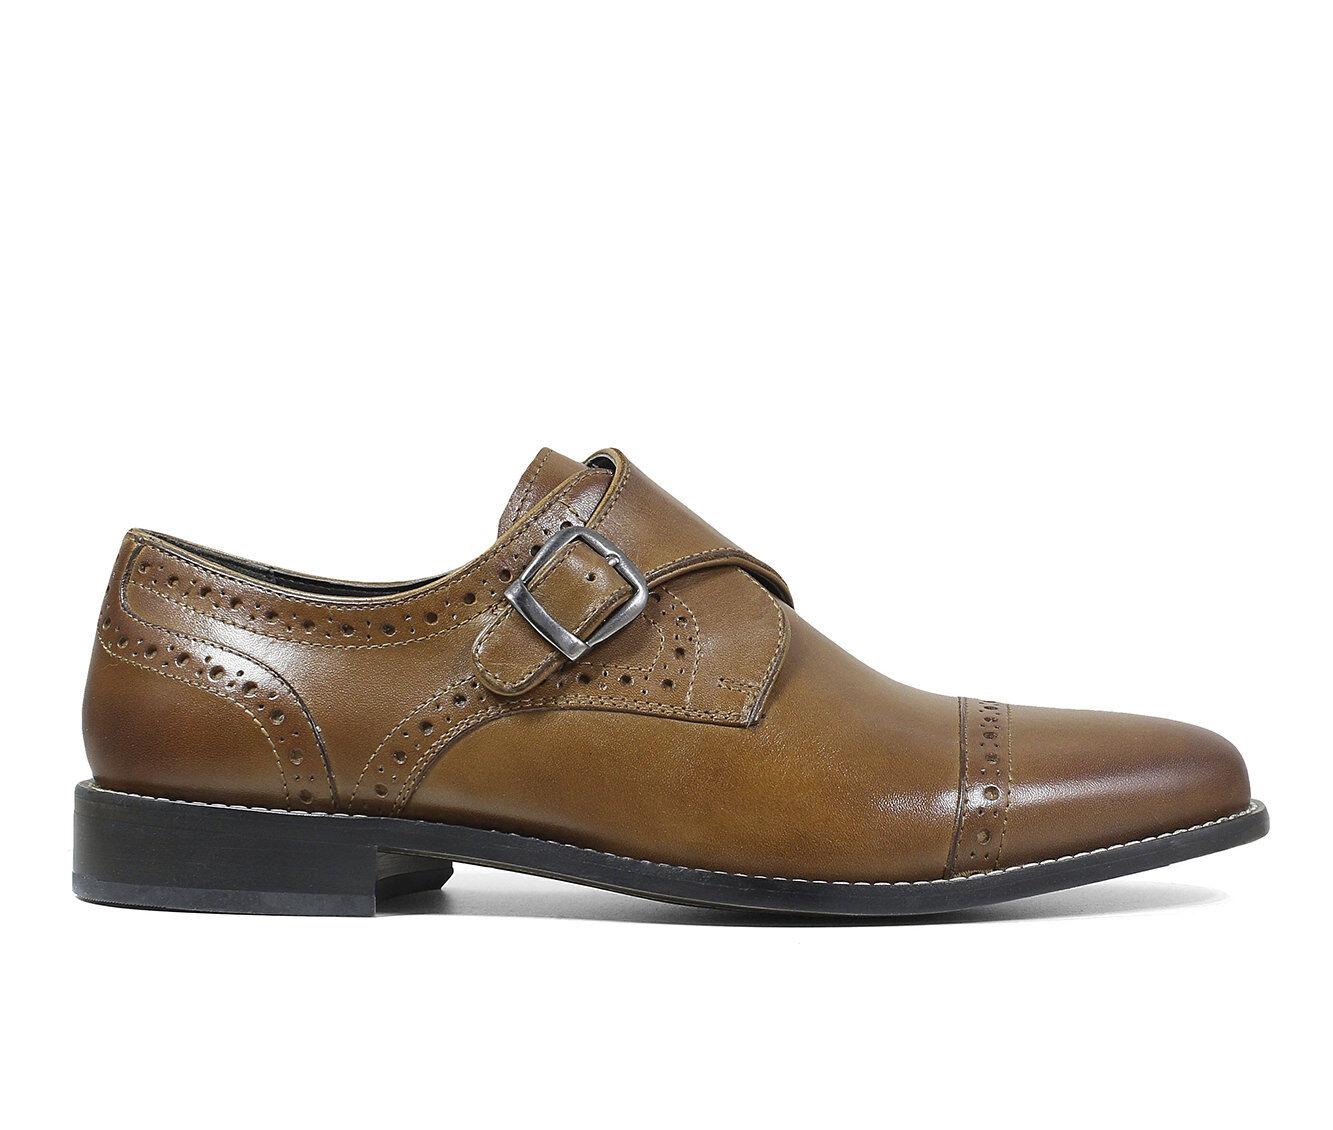 Men's Nunn Bush Newton Cap Toe Monk Strap Dress Shoes Cognac